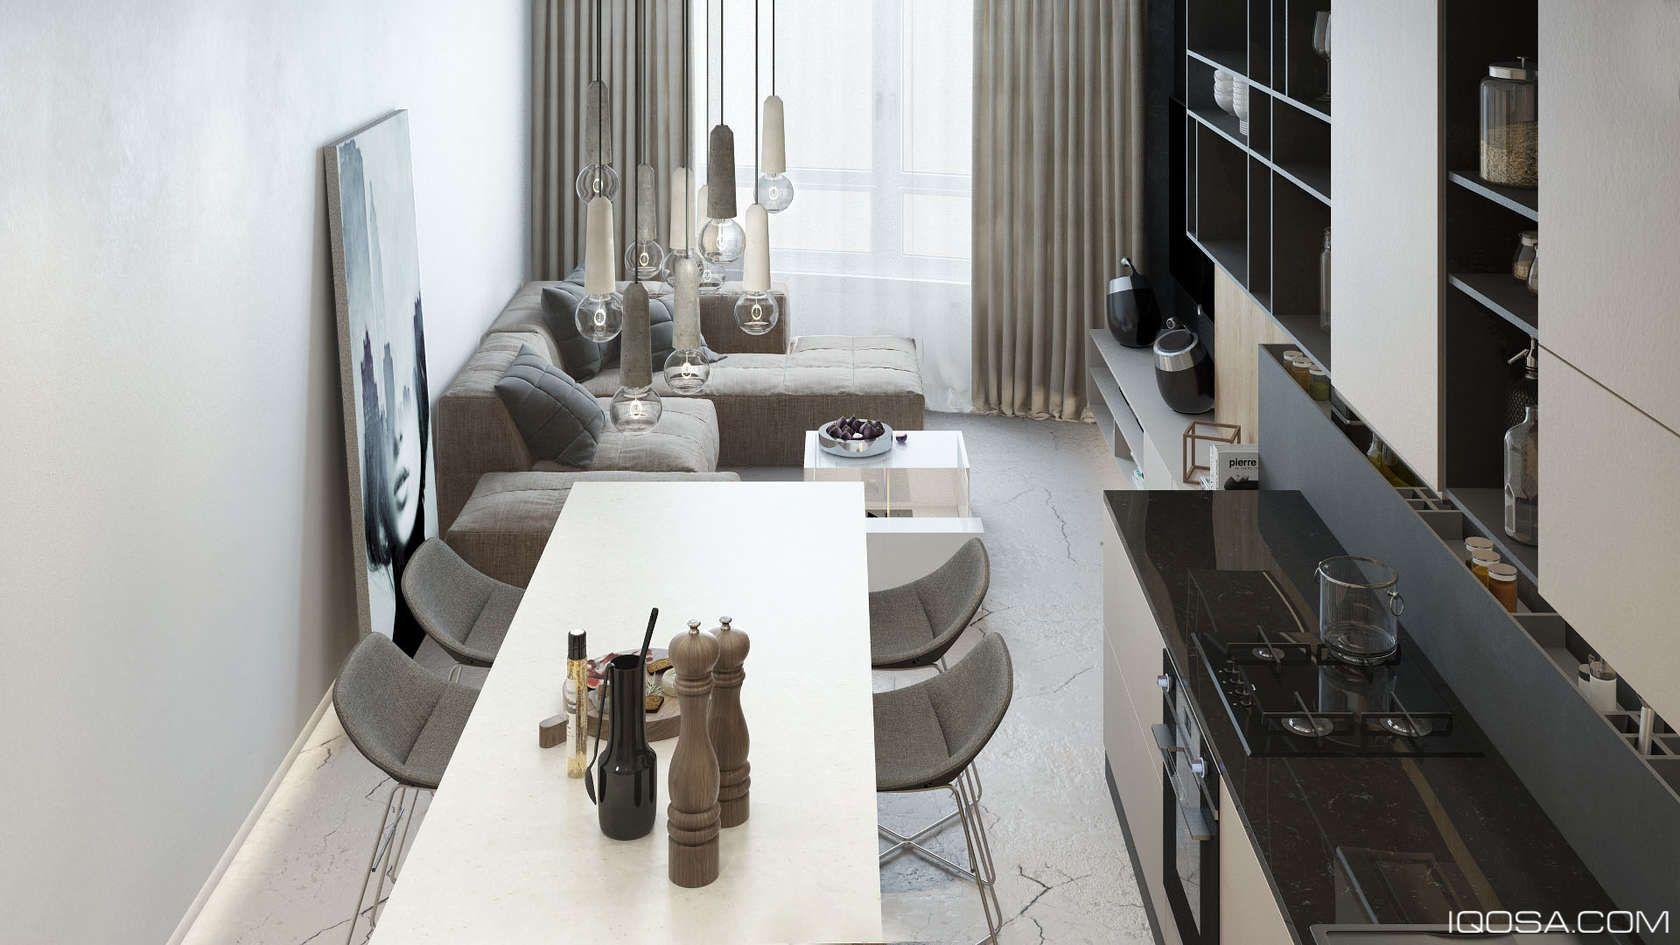 Luxury Small Studio Apartment Design Combined Modern And Minimalist Style Decor Looks Stunning Luxury Apartments Interior Apartment Layout Apartment Design